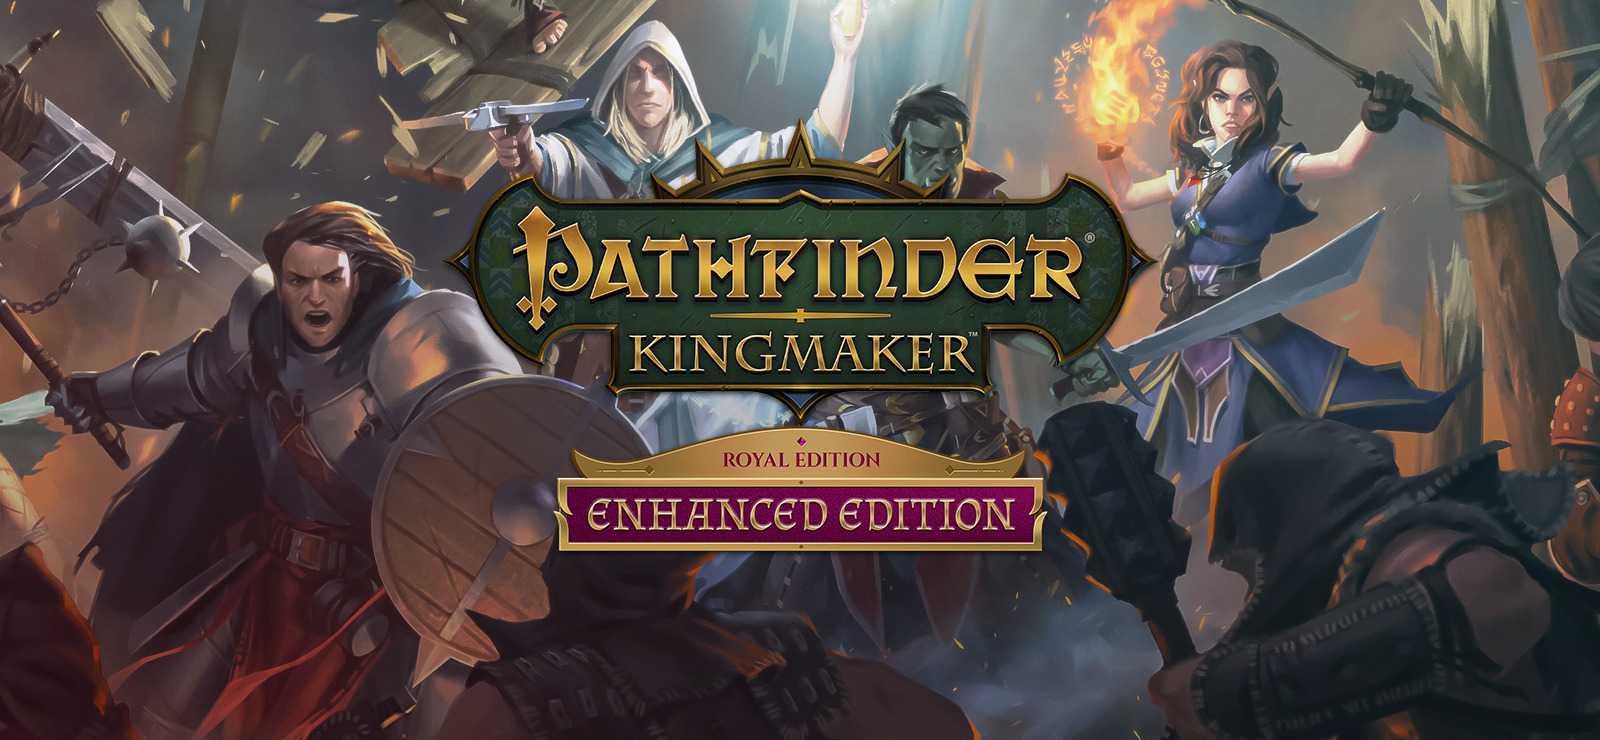 Pathfinder: Kingmaker - Royal Edition